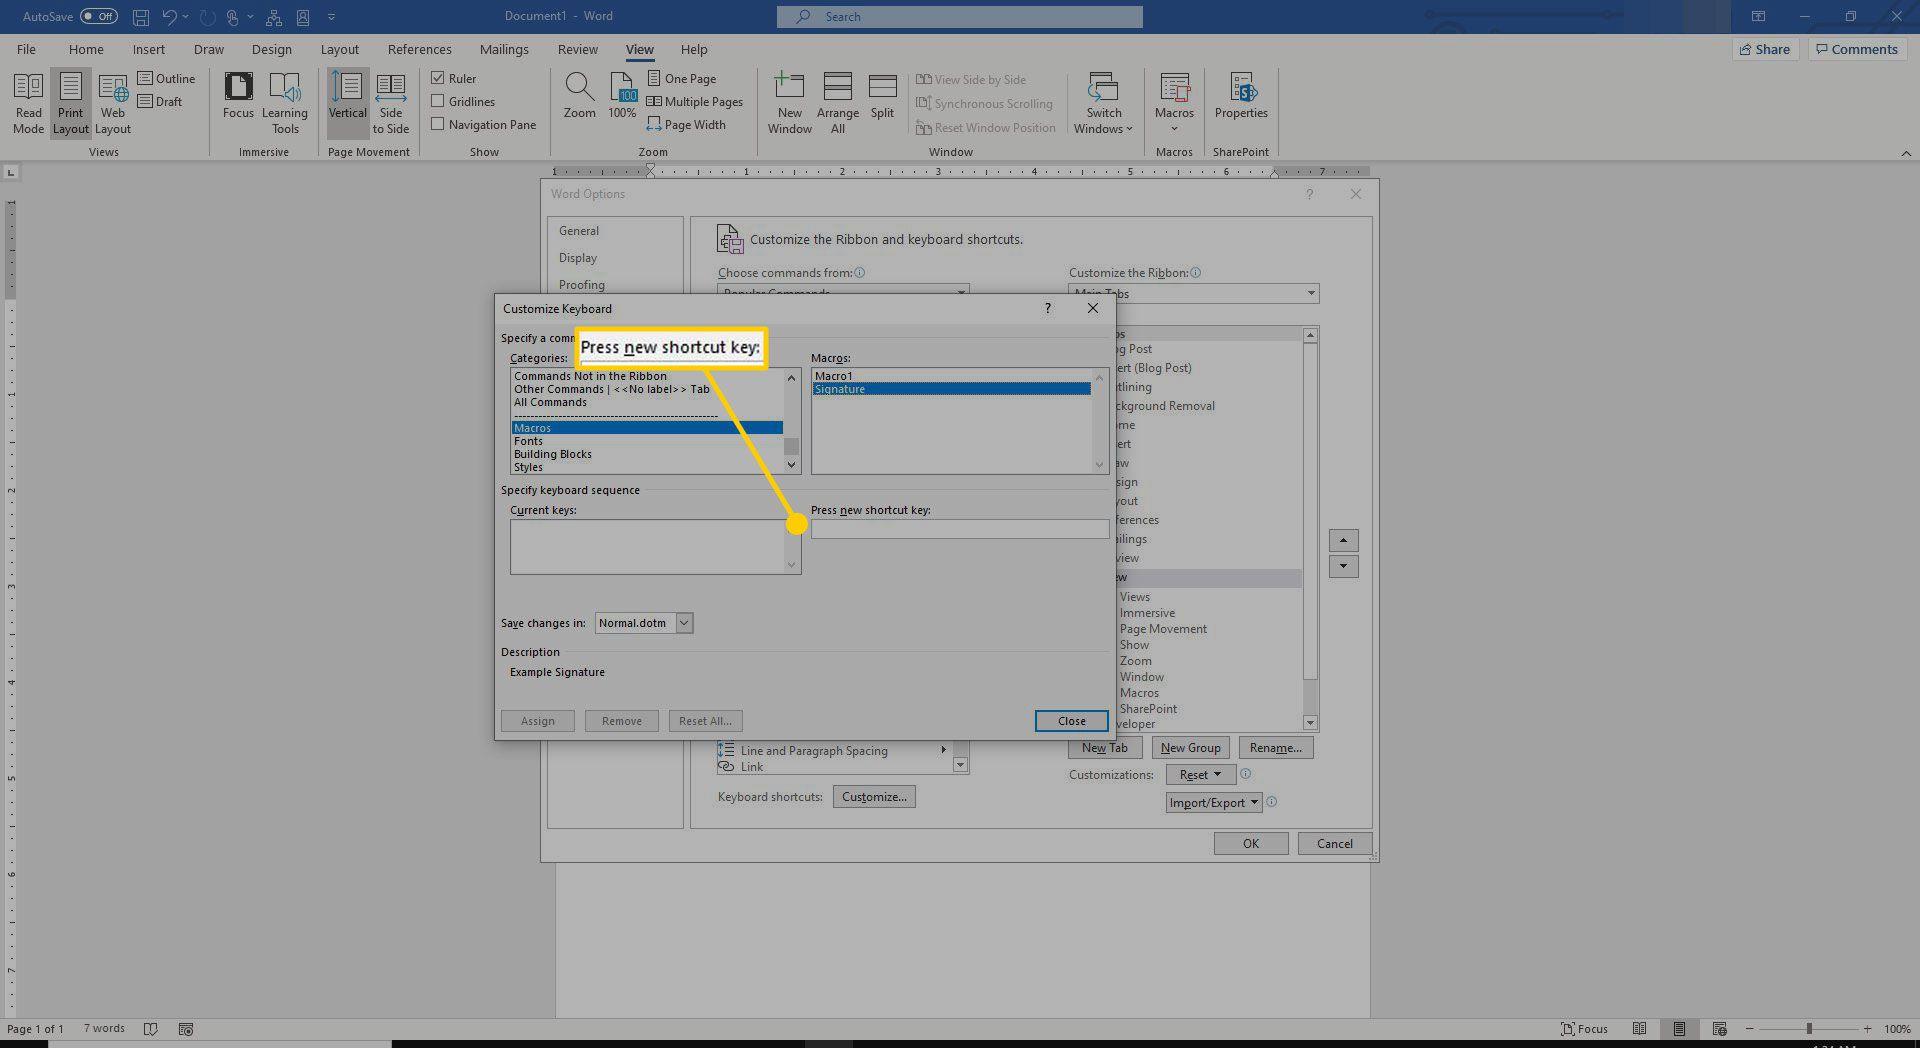 Press new shortcut key menu in Word